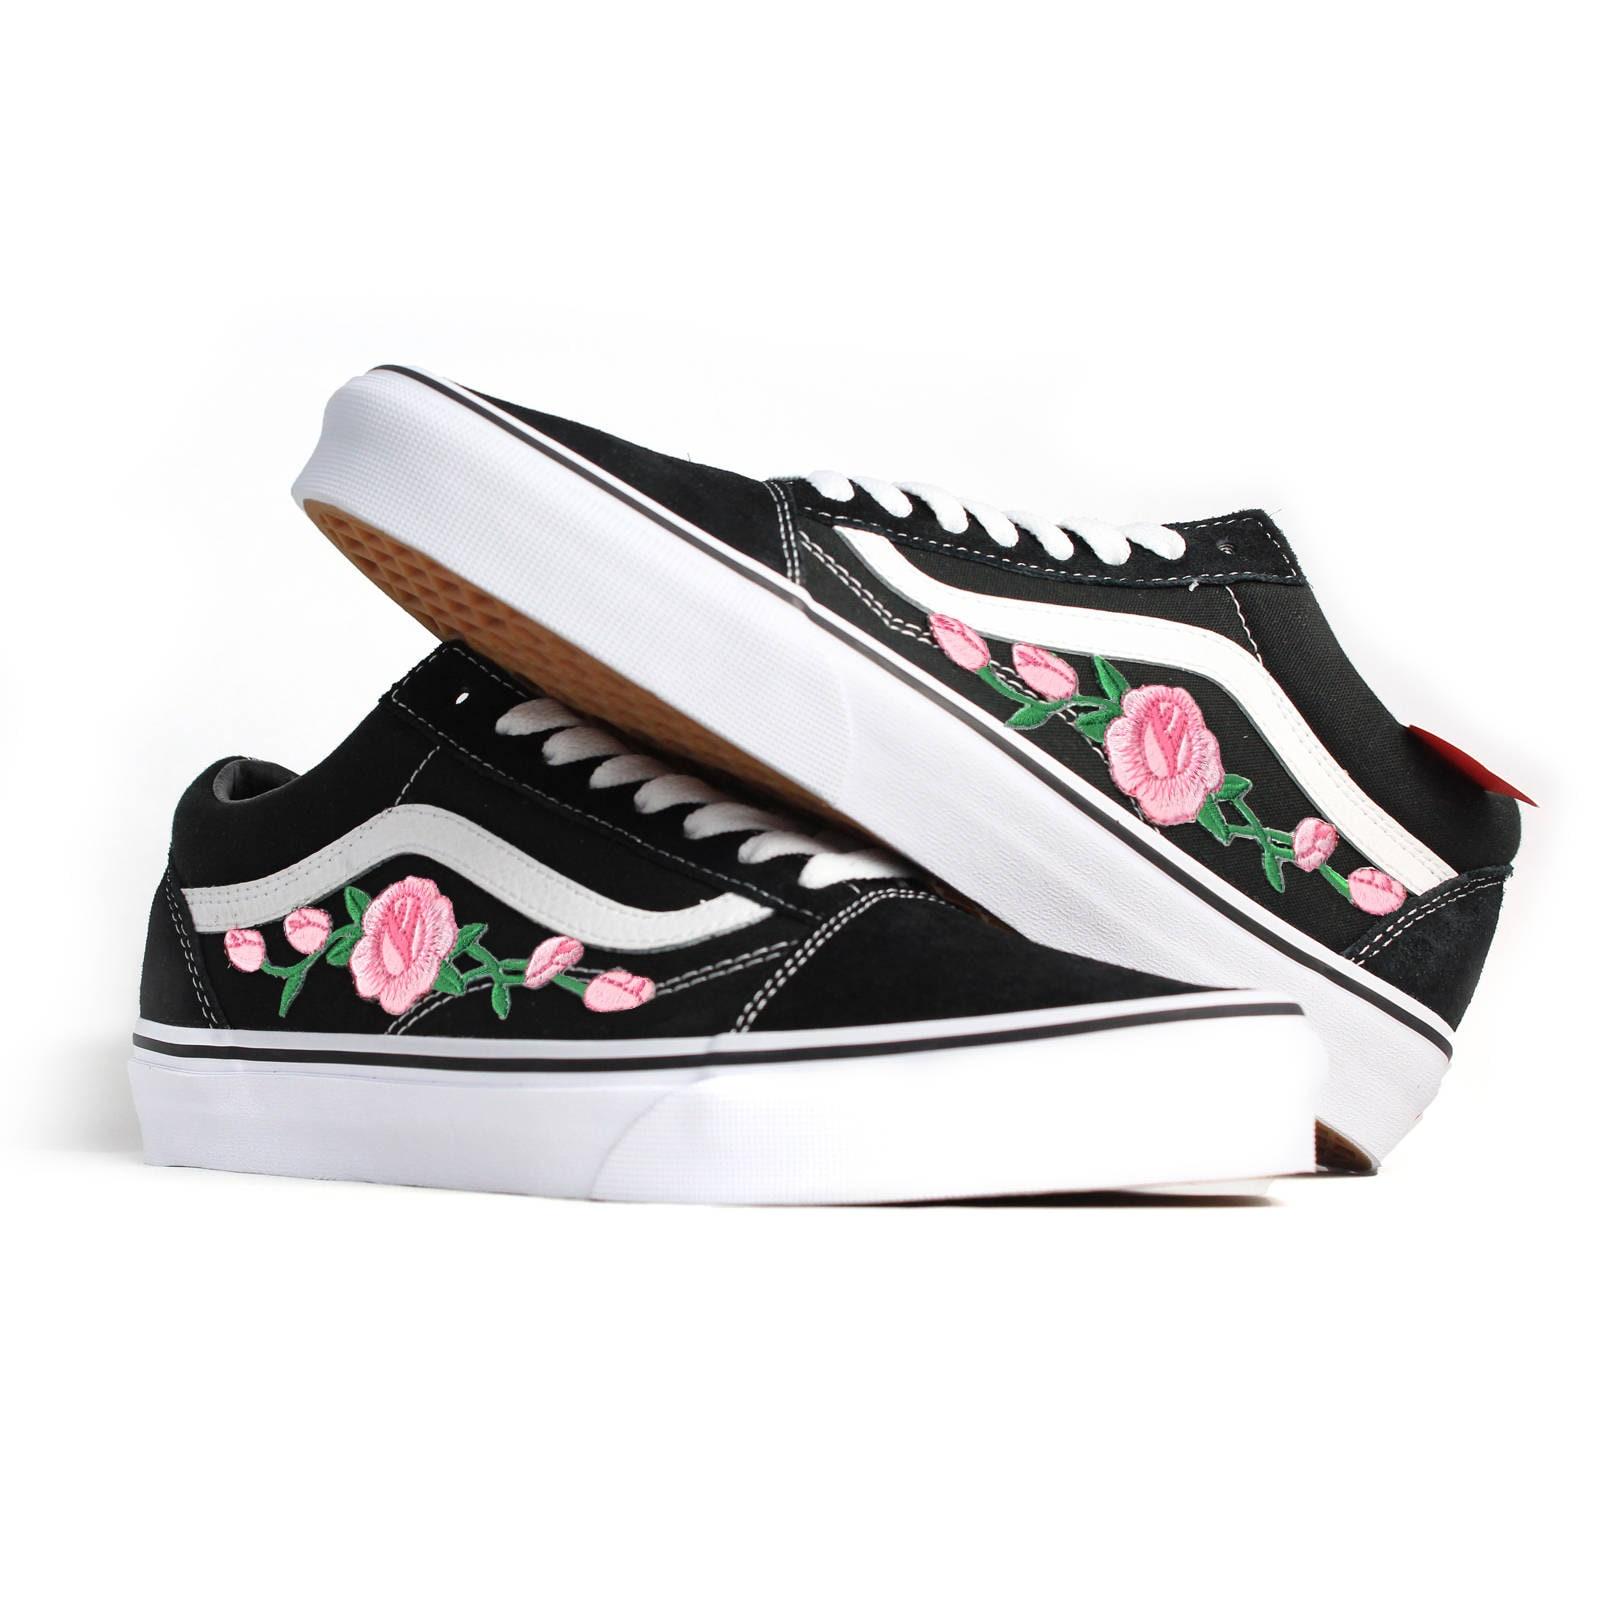 Old Skool Etsy Rose Noirs Chaussures Broderie Vans CEx5qw1YF1